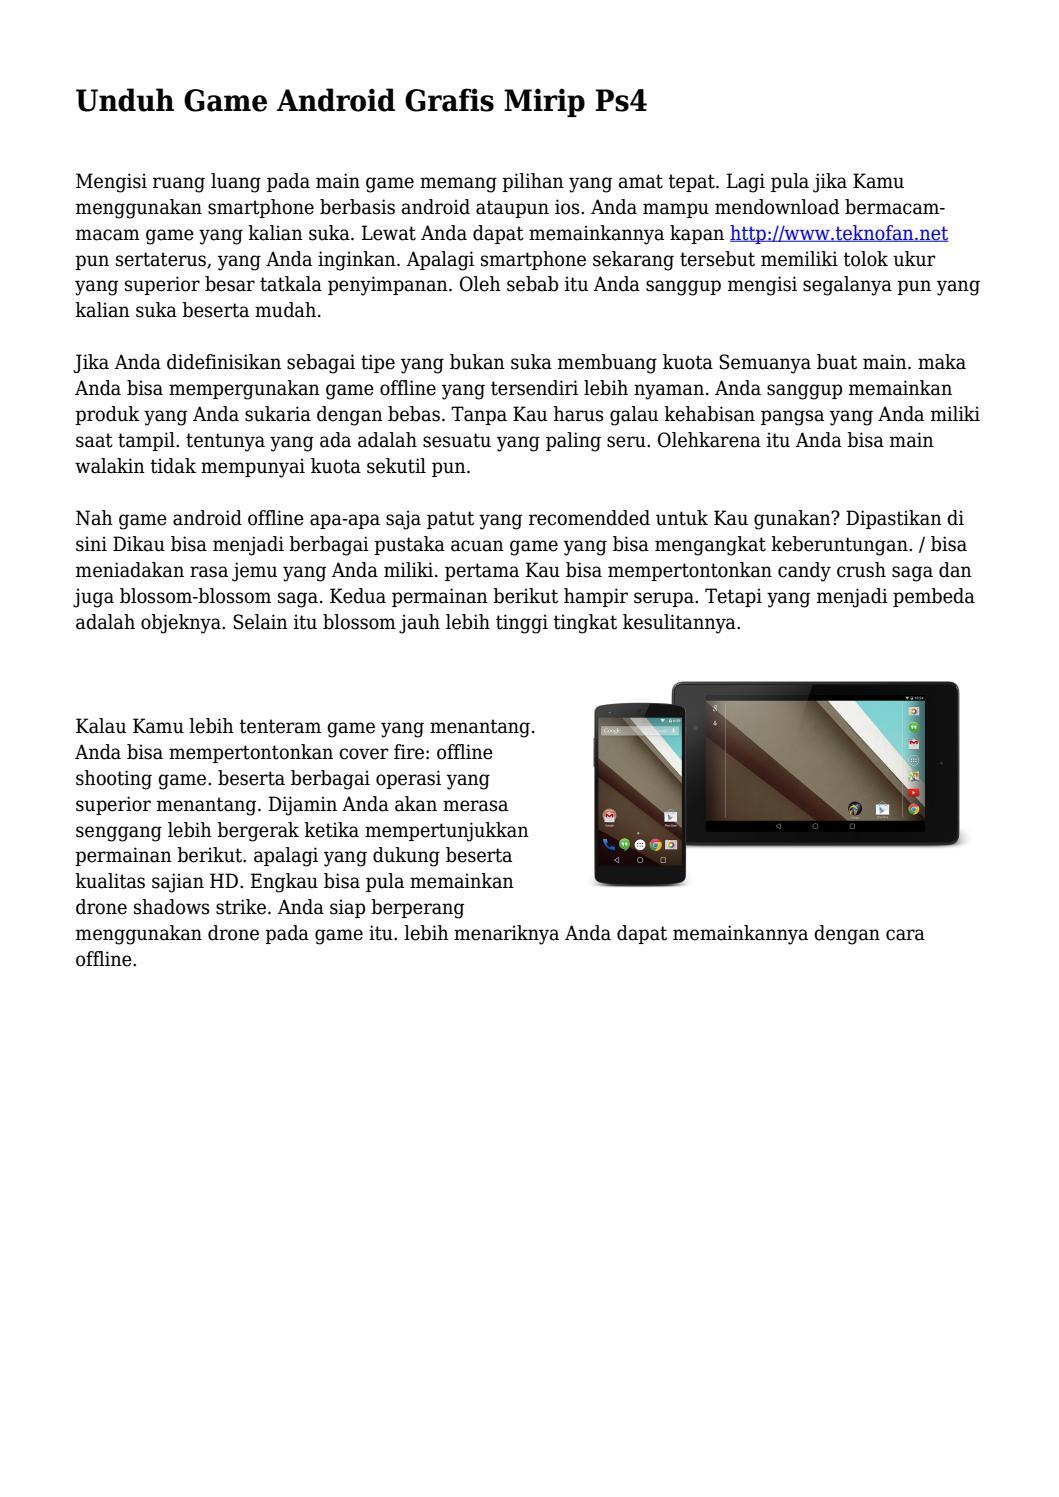 Unduh Game Android Grafis Mirip Ps4 by topteknobaru - issuu